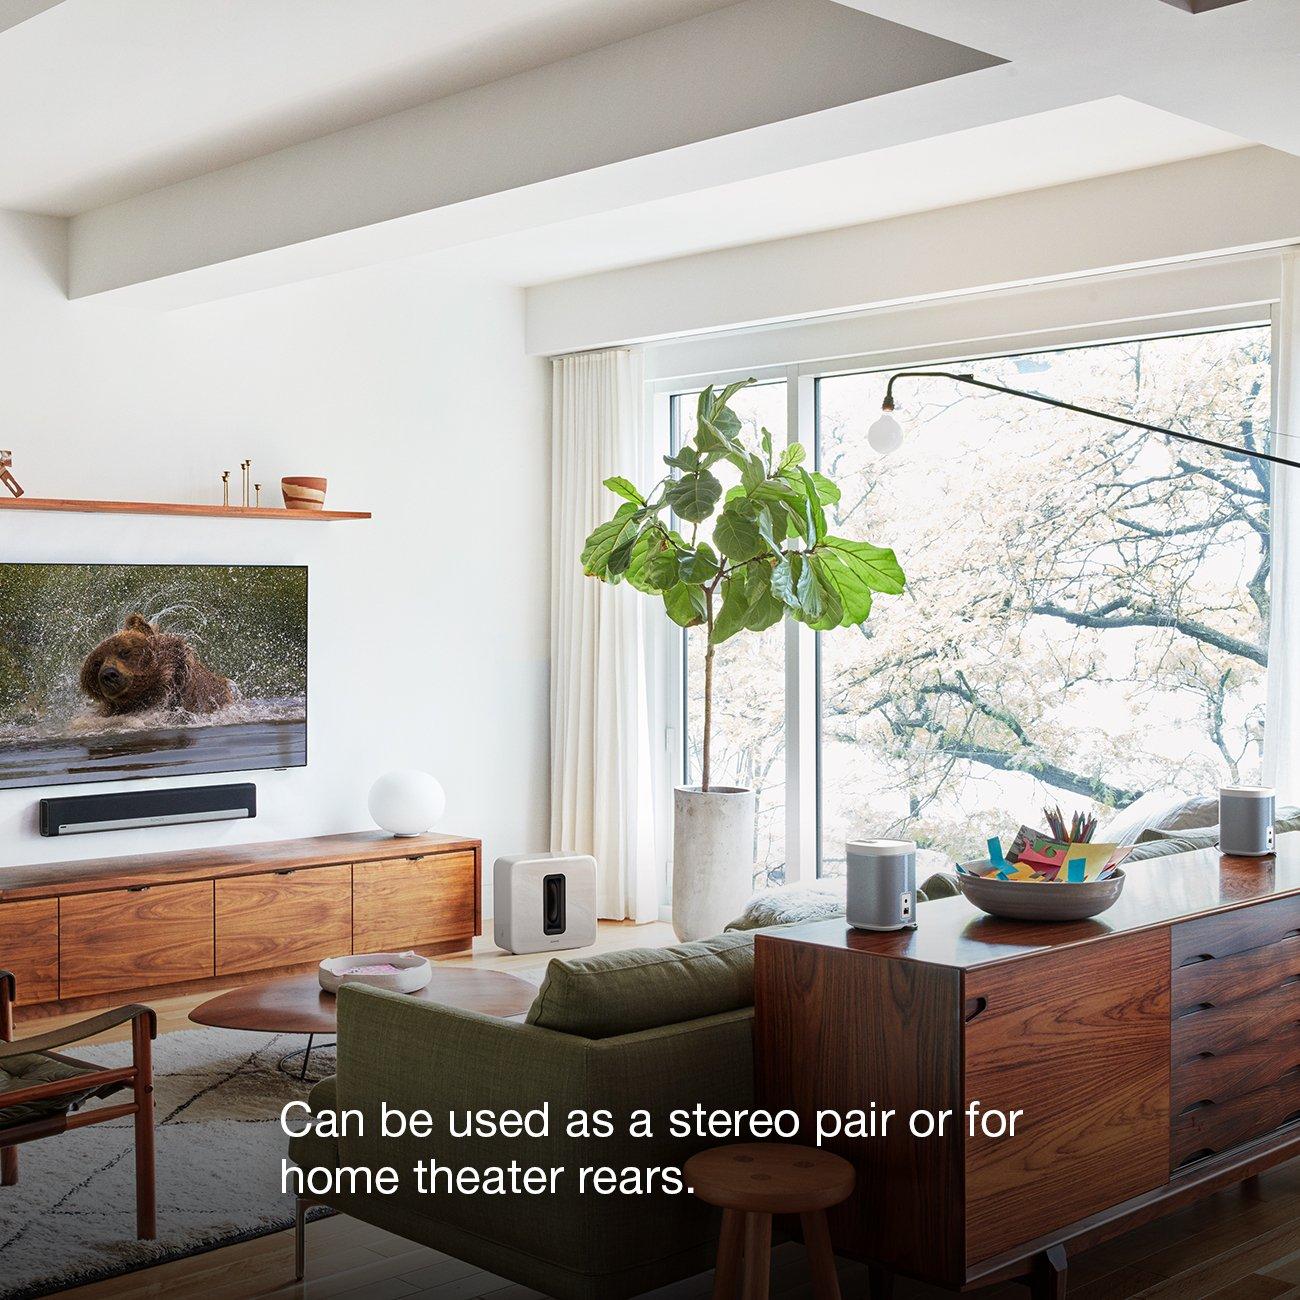 Amazon.com: Sonos PLAY:1 2-Room Wireless Smart Speakers for ...